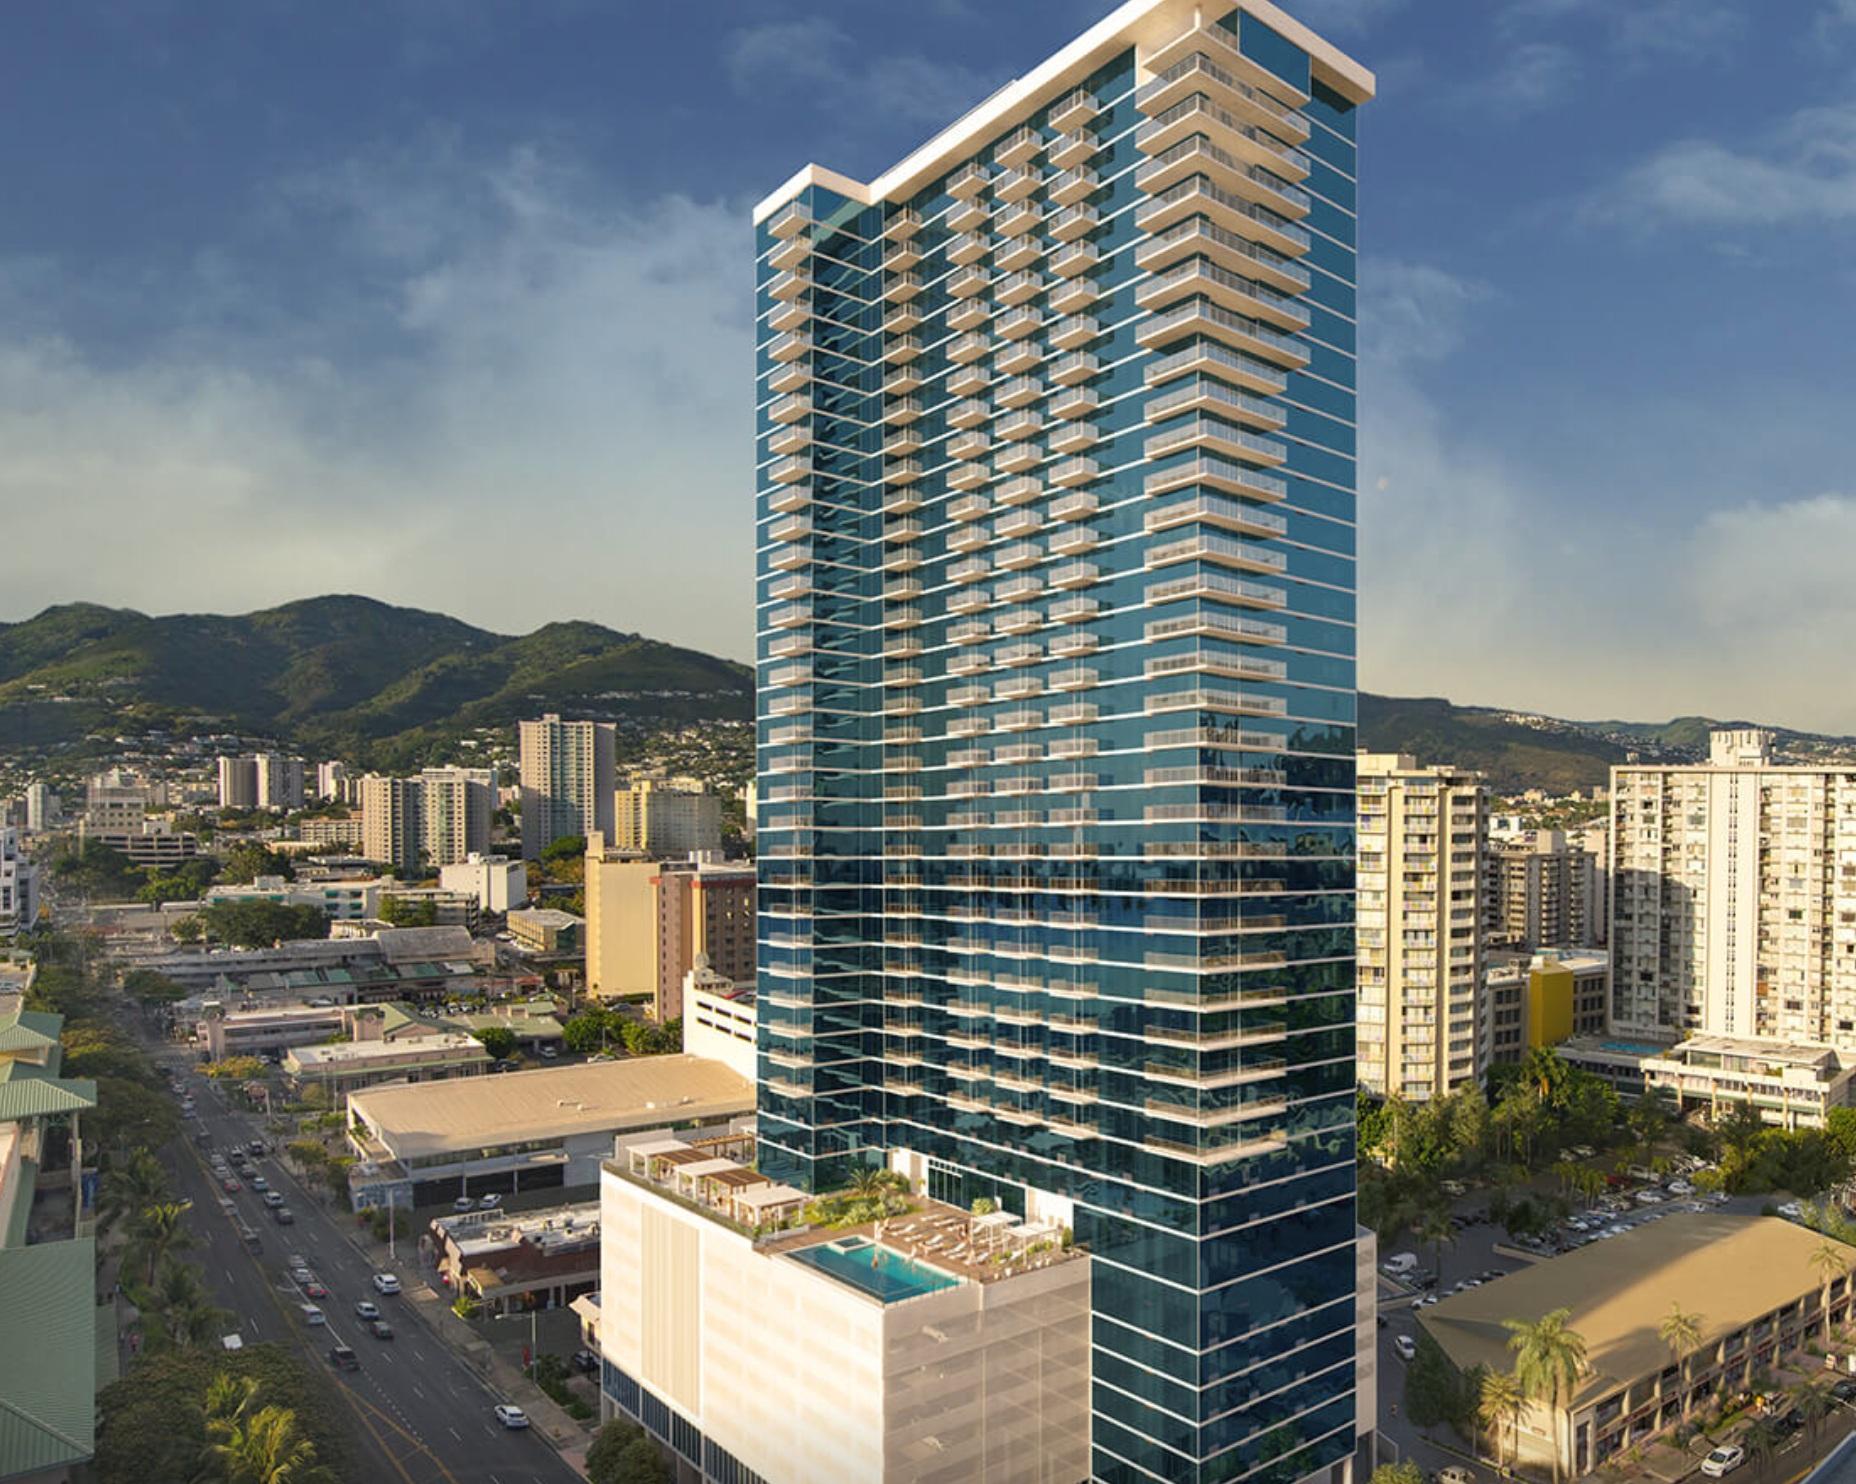 MIDTOWN ALA MOANA - The Kapiolani Corridor transforms. Entry Level to Ultra-Luxury Condos in Honolulu.